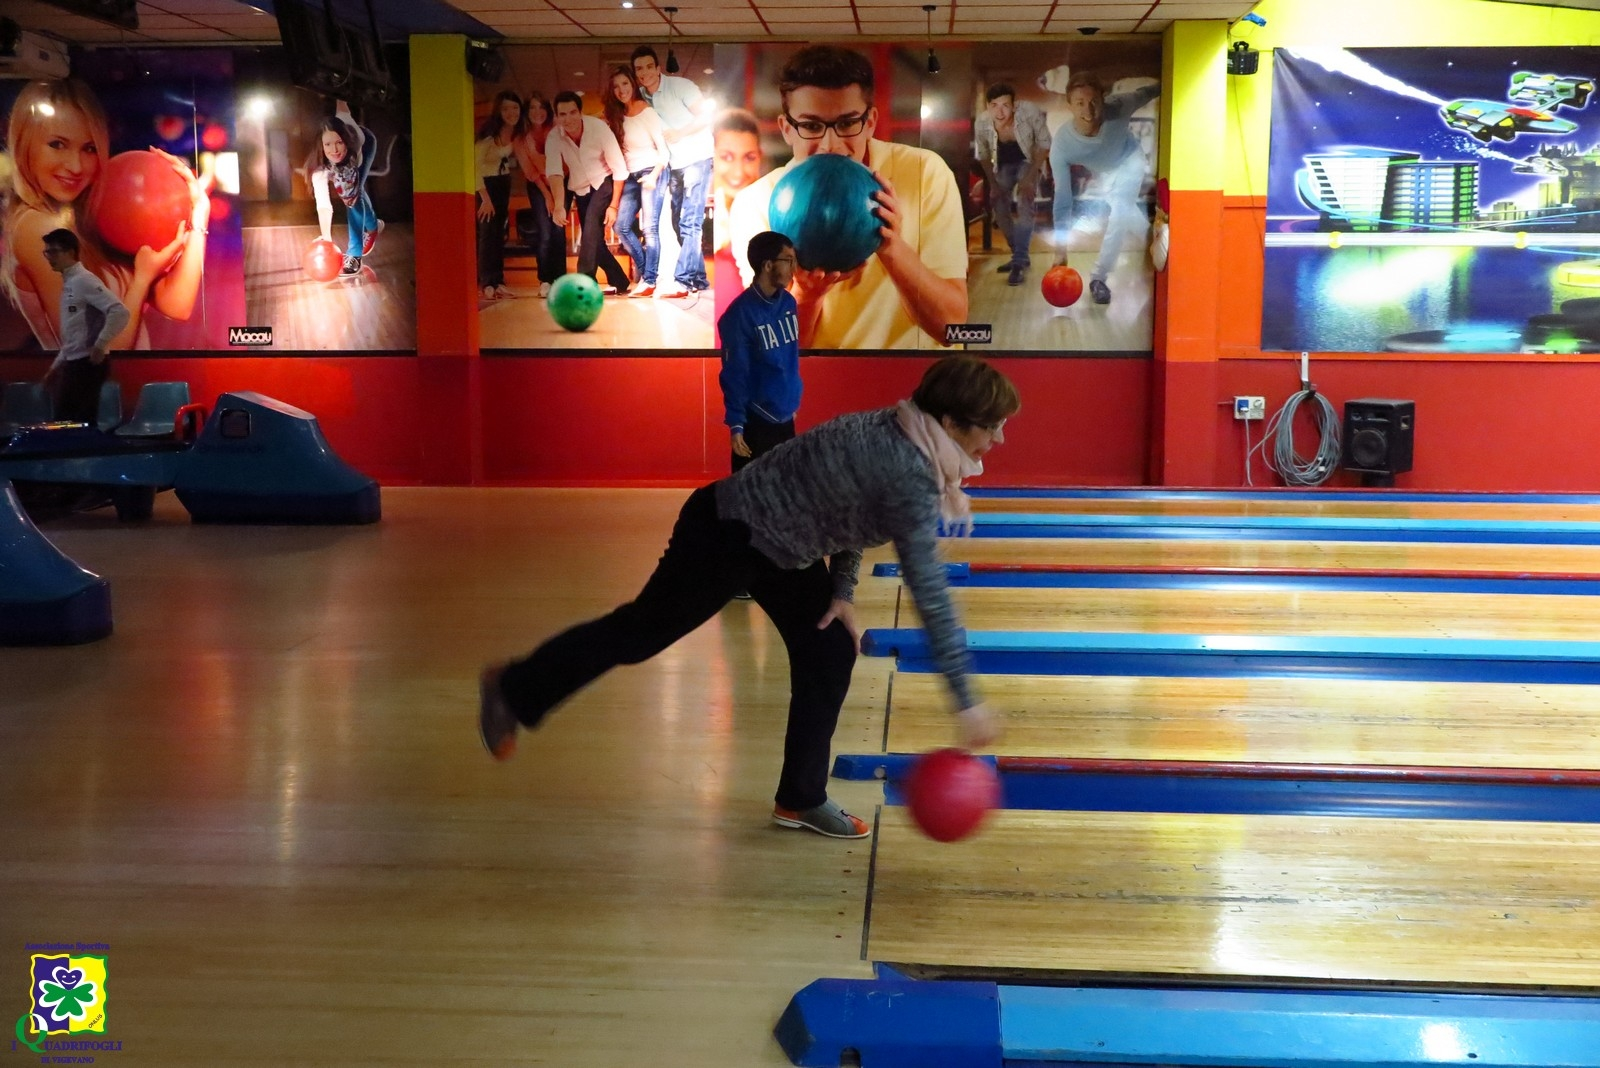 Torneo Bowling Vigevano 19-12-2018 - 010